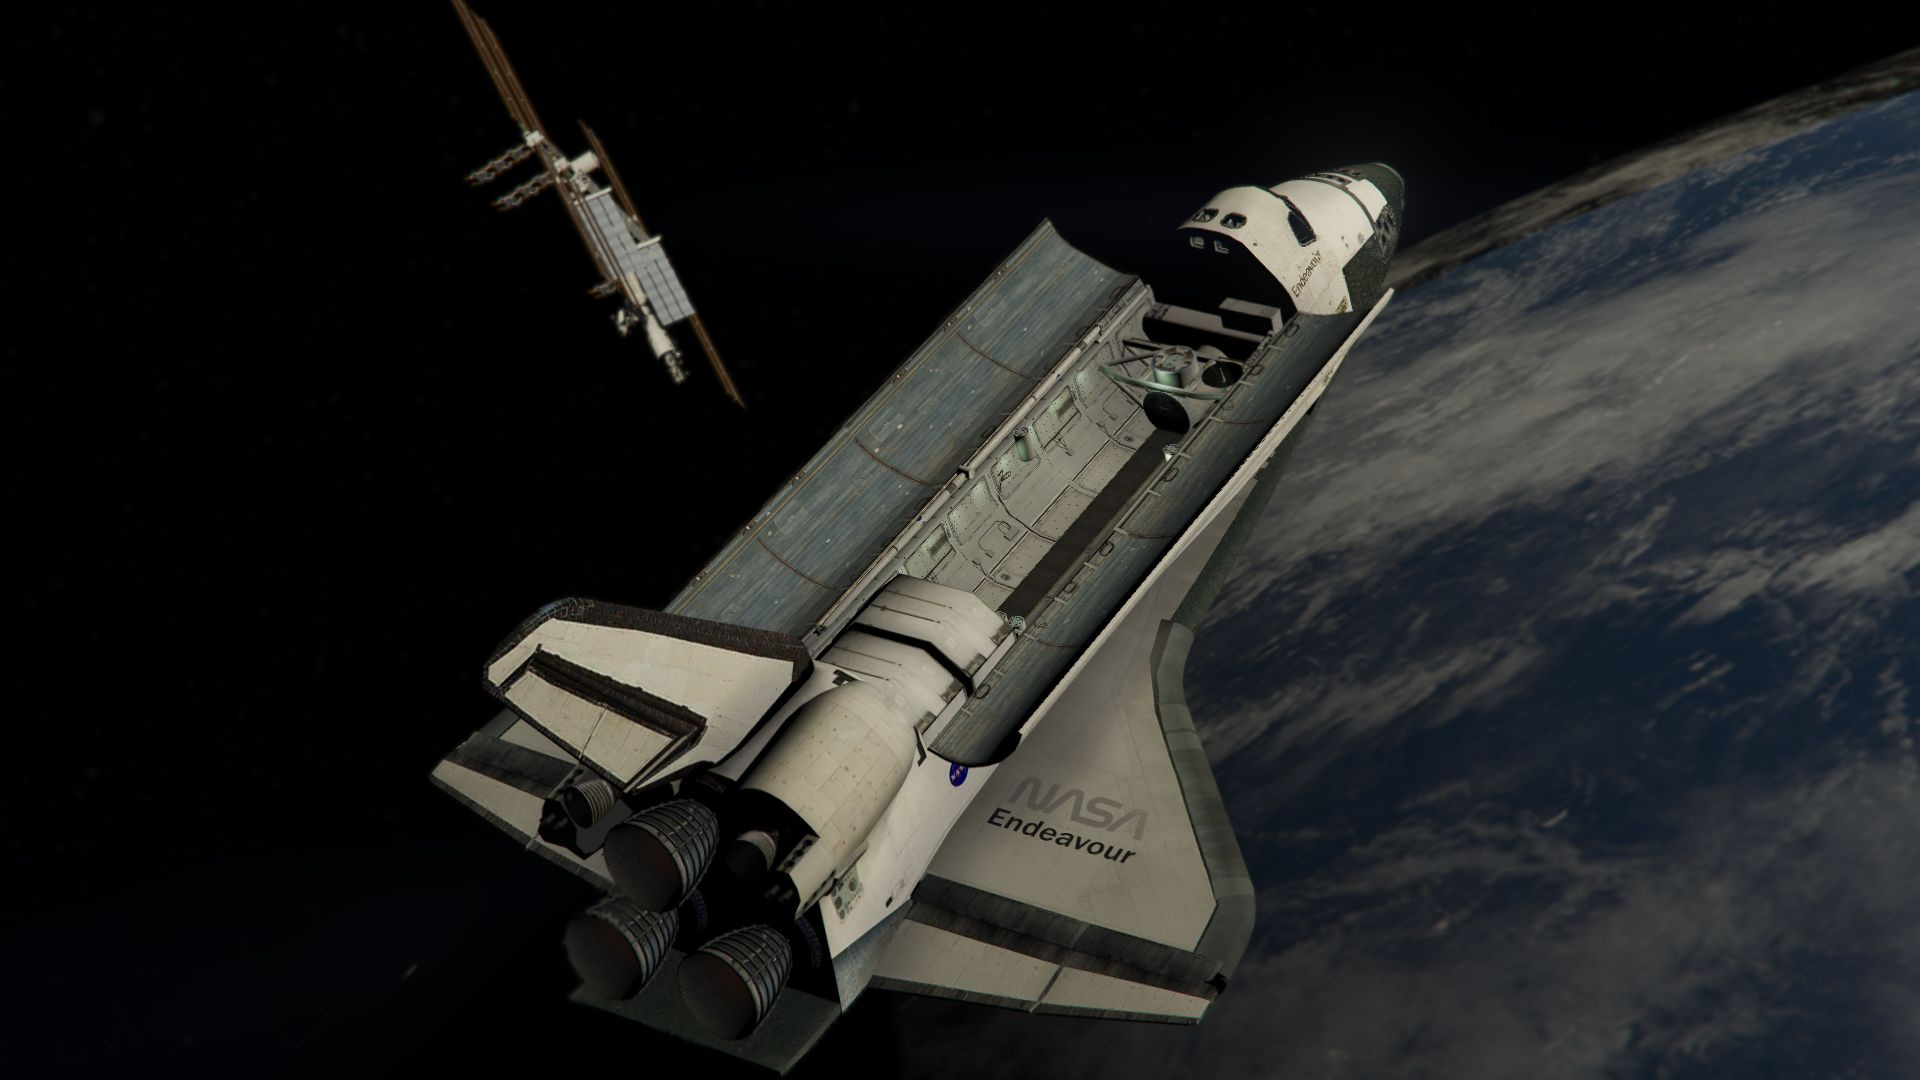 space shuttle namen - photo #12